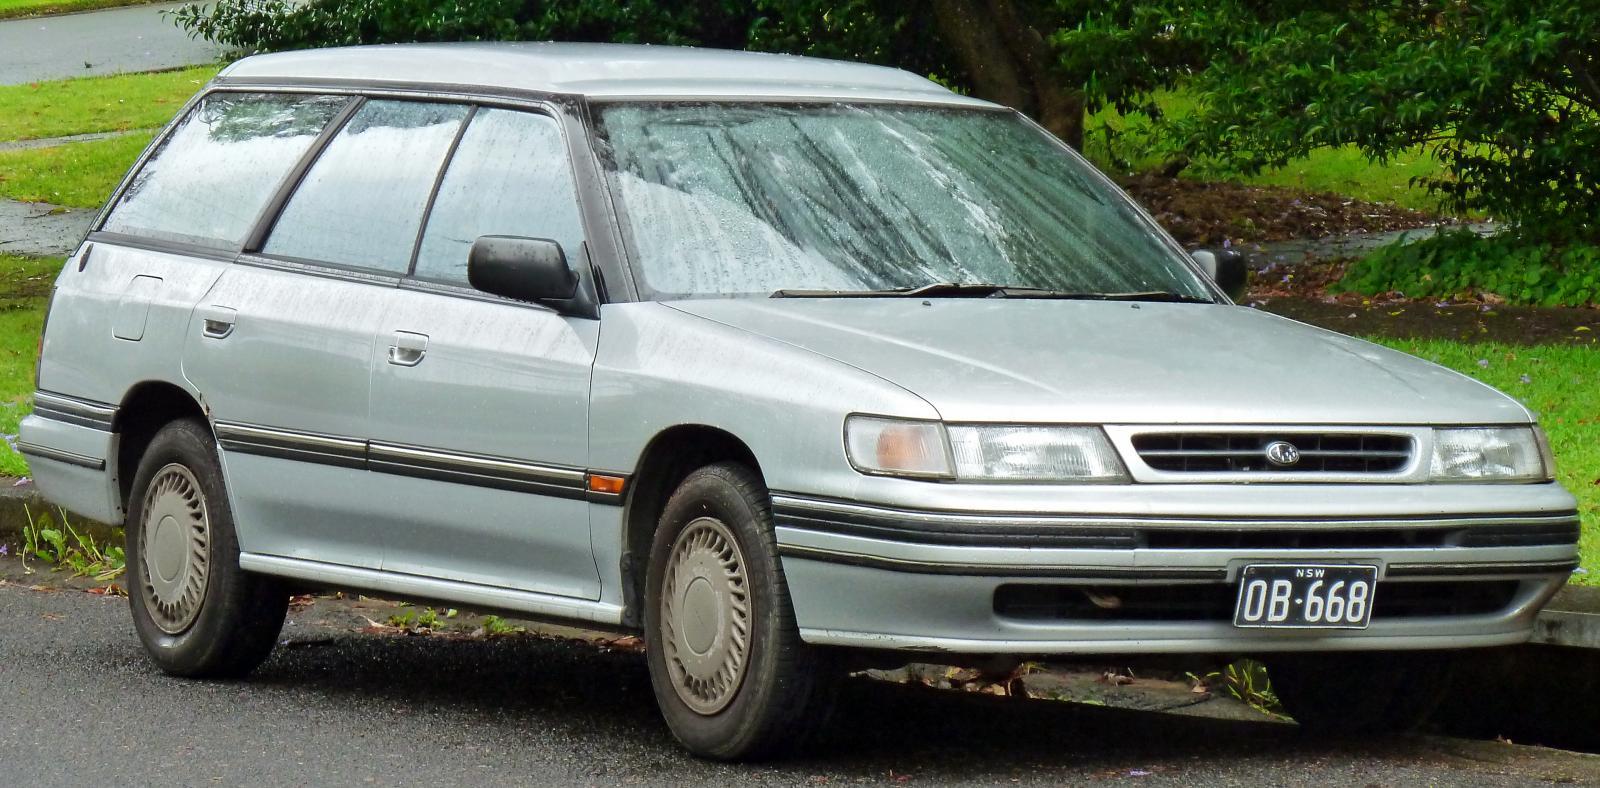 1994 Subaru Legacy Information And Photos Zombiedrive 94 Wiring Diagram 800 1024 1280 1600 Origin